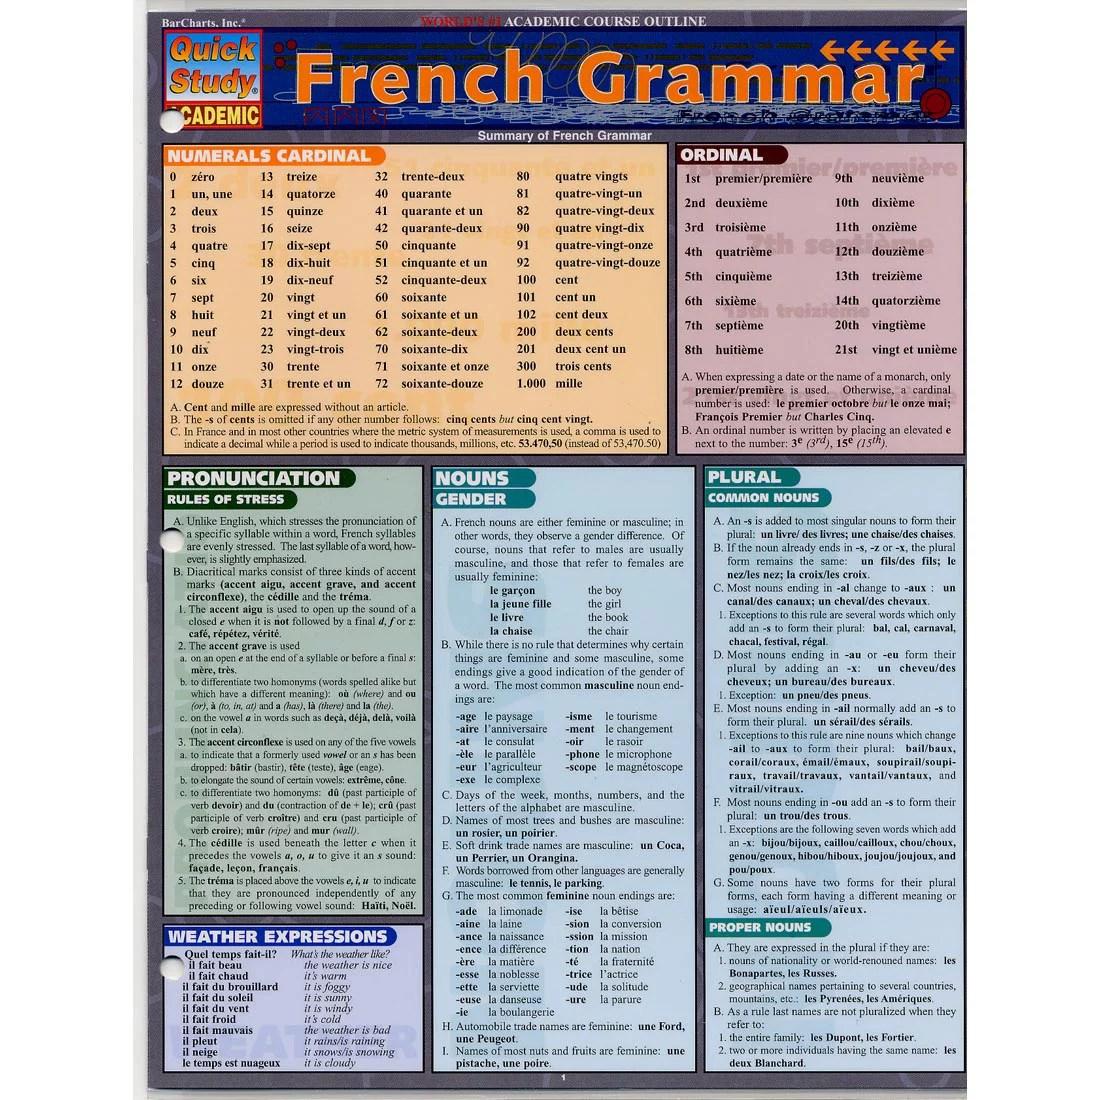 Barcharts Inc French Grammar